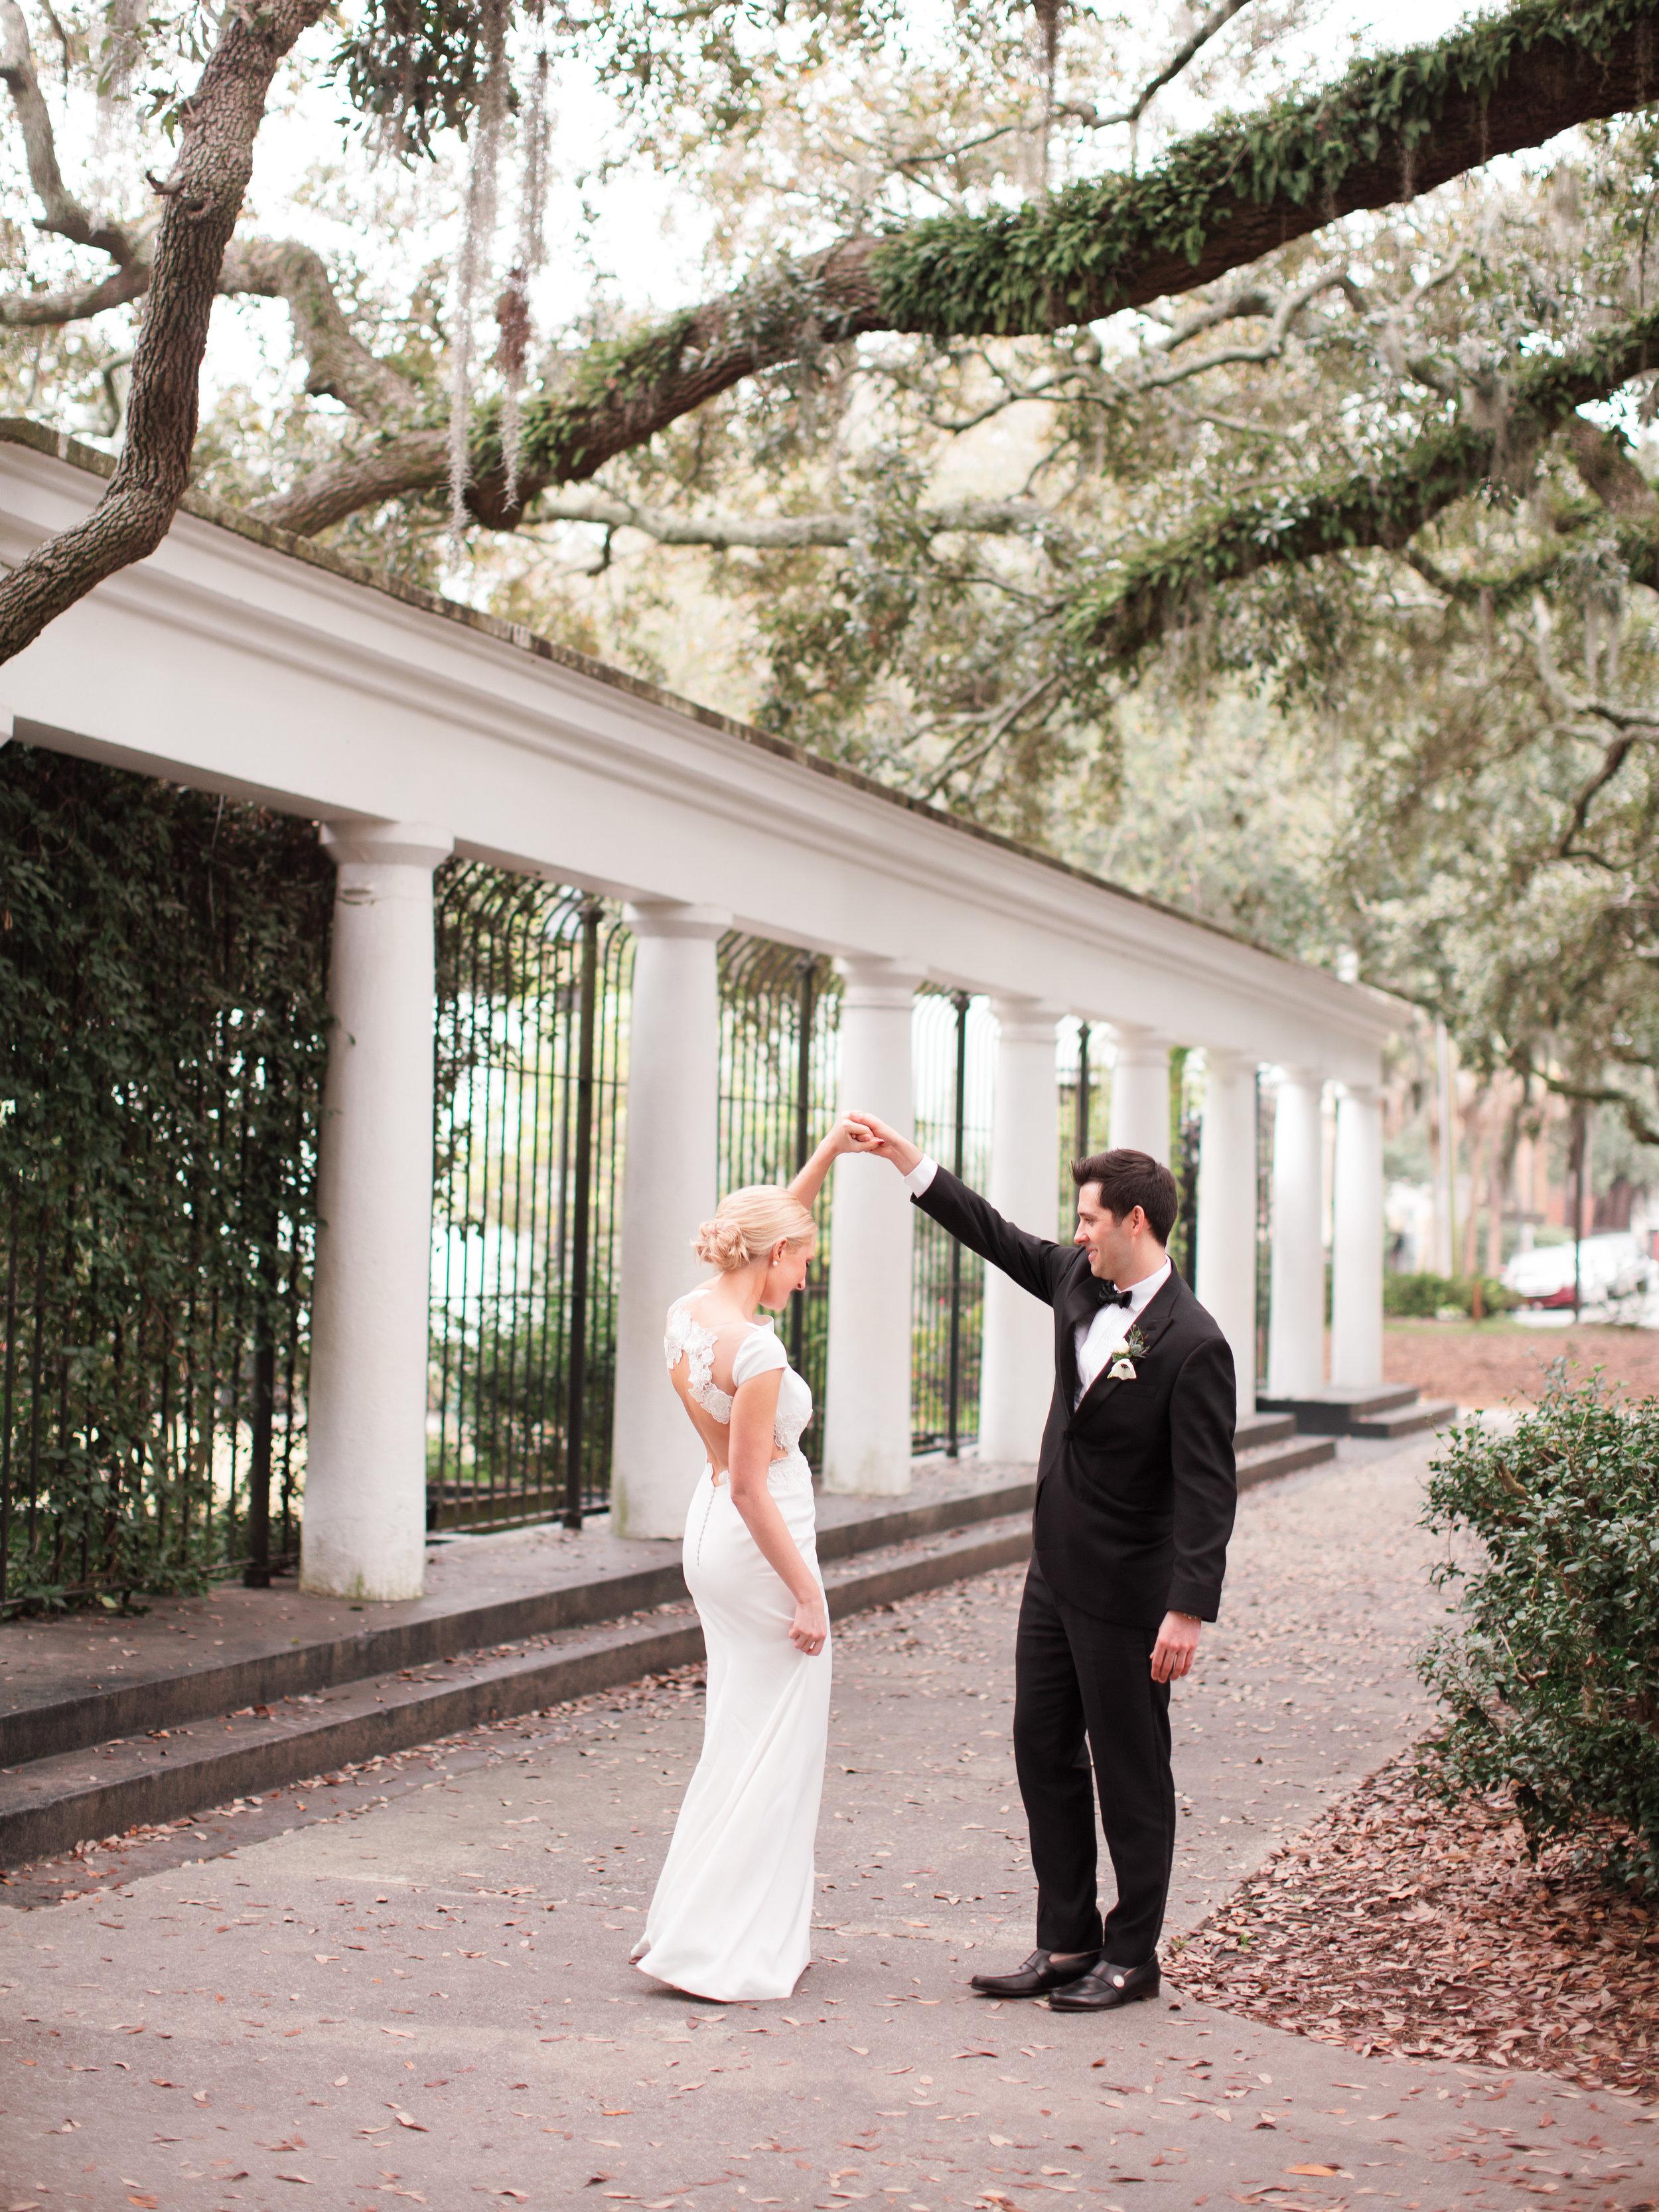 ivory_and_beau_couple_kate_and_dustin_wedding_flowers_savannah_florist_spring_wedding_georgia_6.jpg